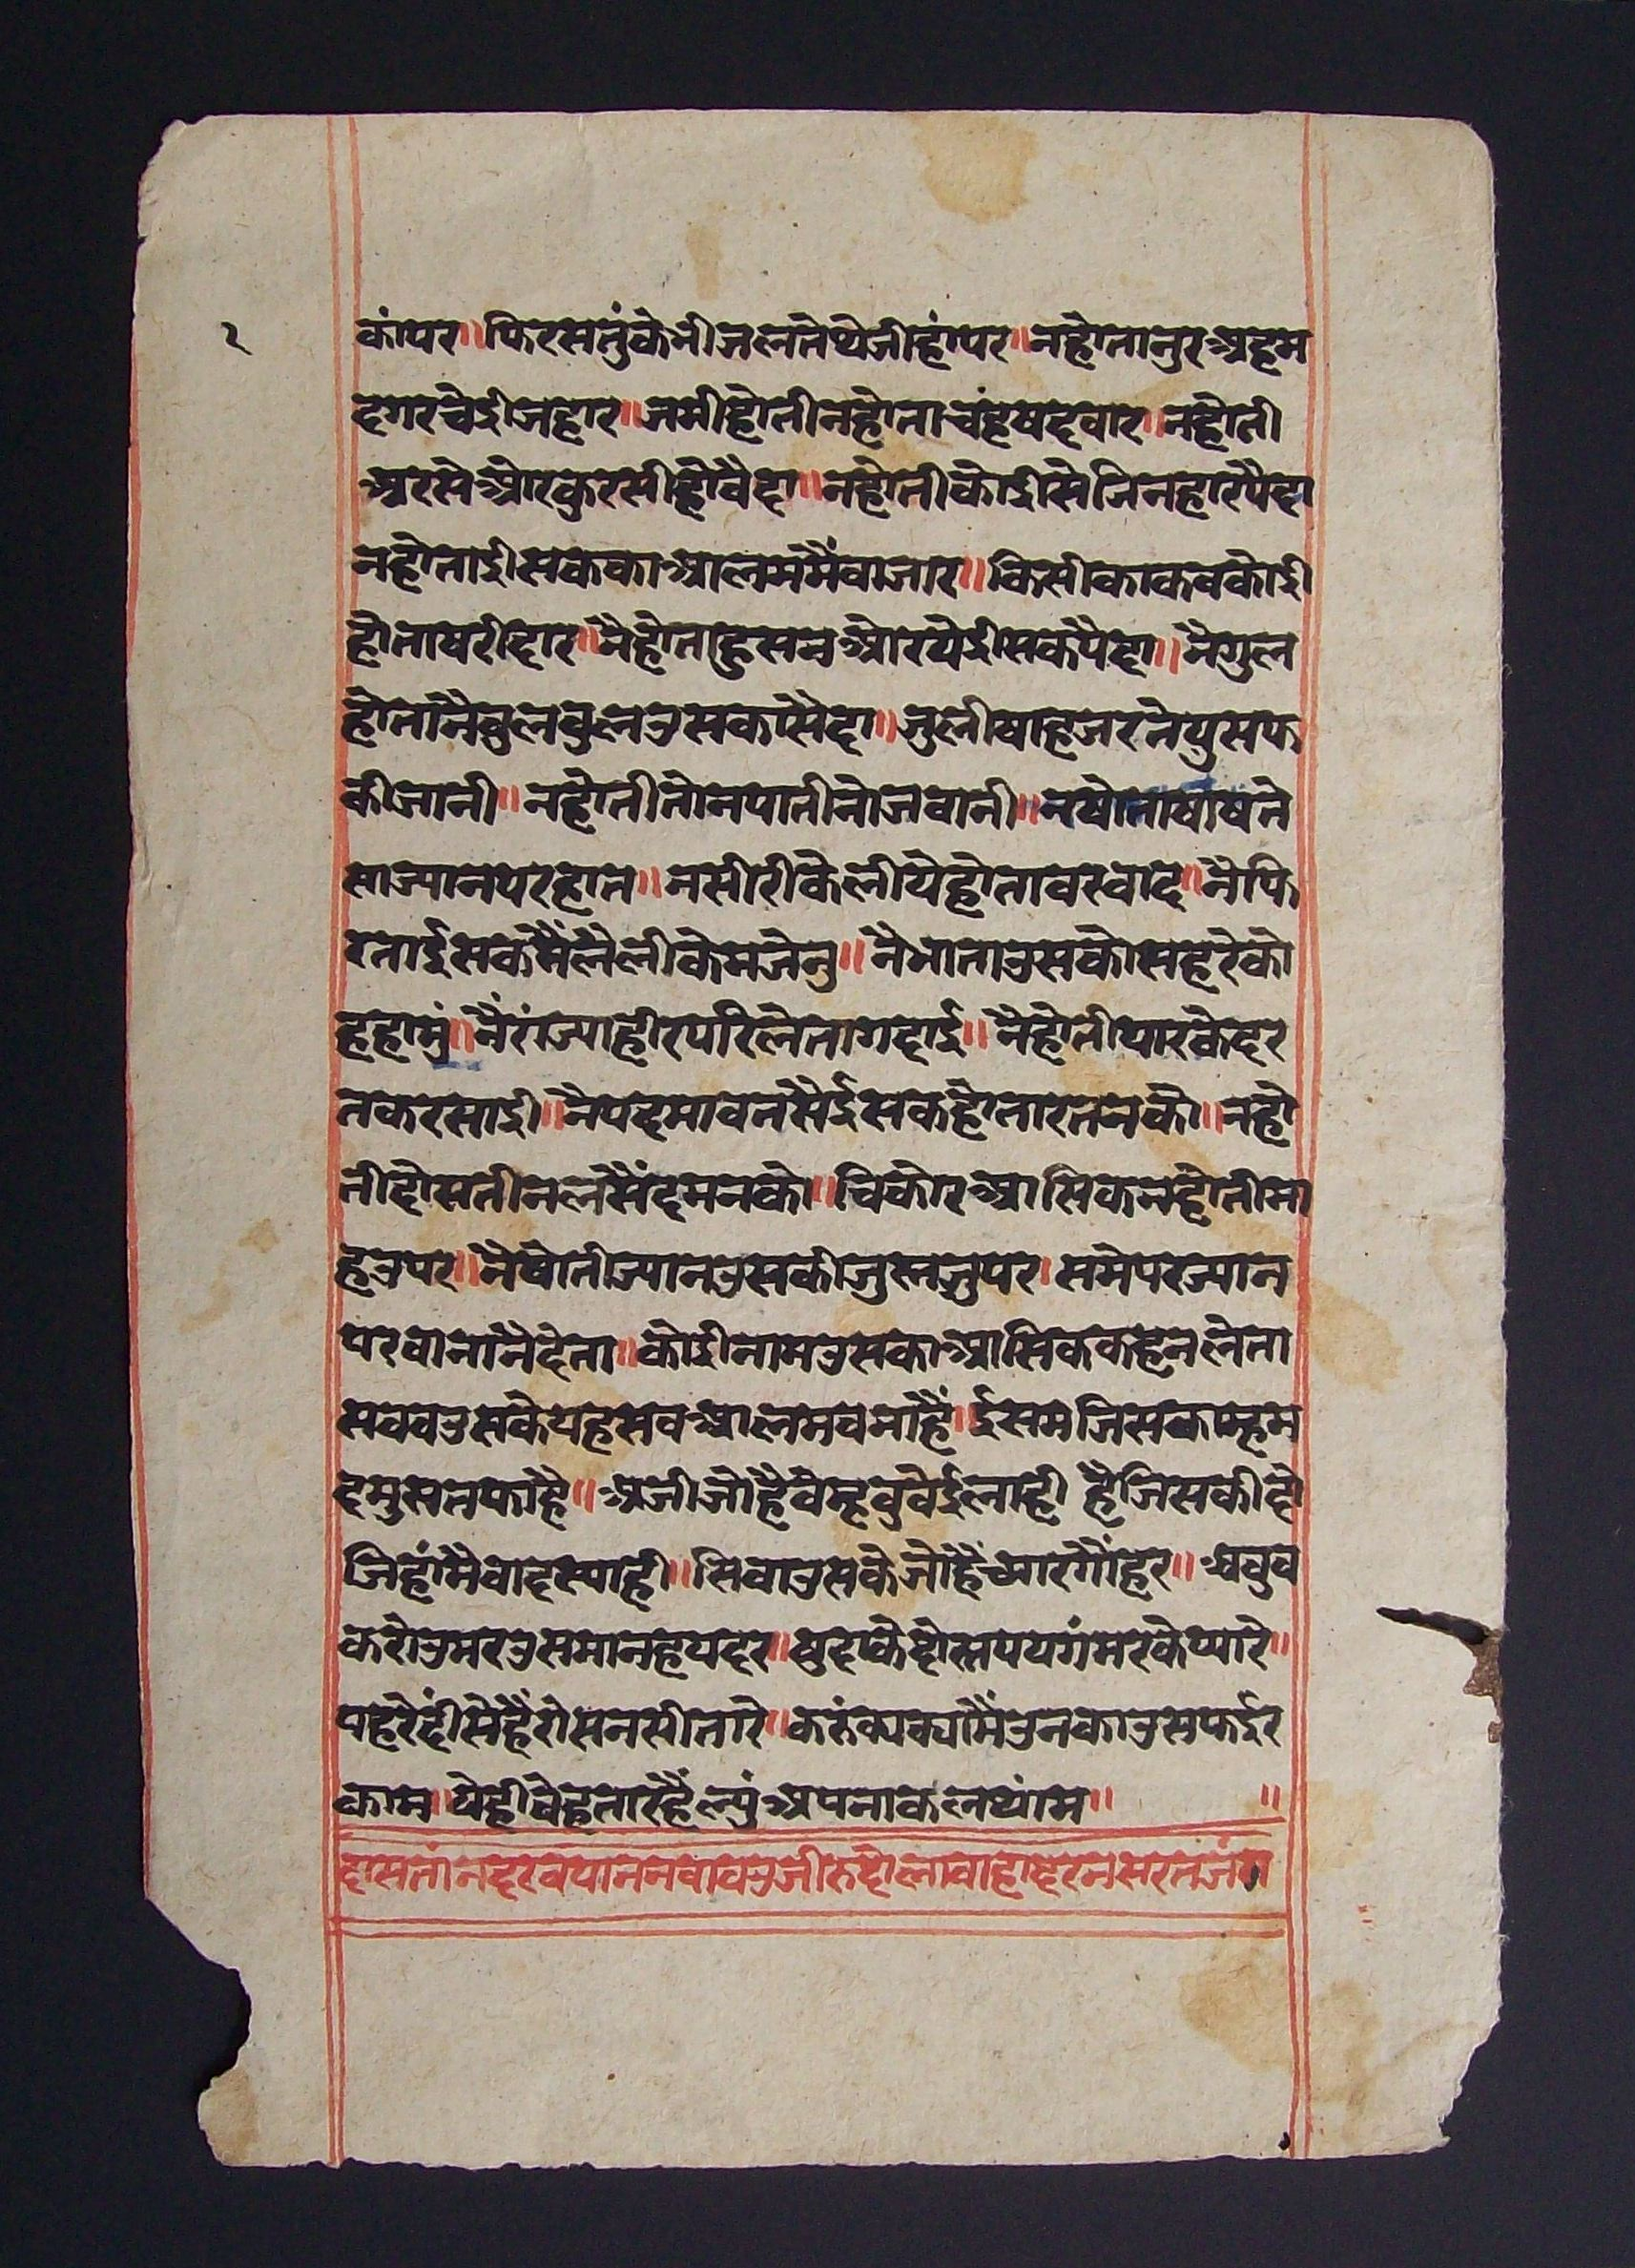 Indian manuscript%2C Devanagari script on paper A incrível história de 10.000 anos que a humanidade compartilha com a cannabis